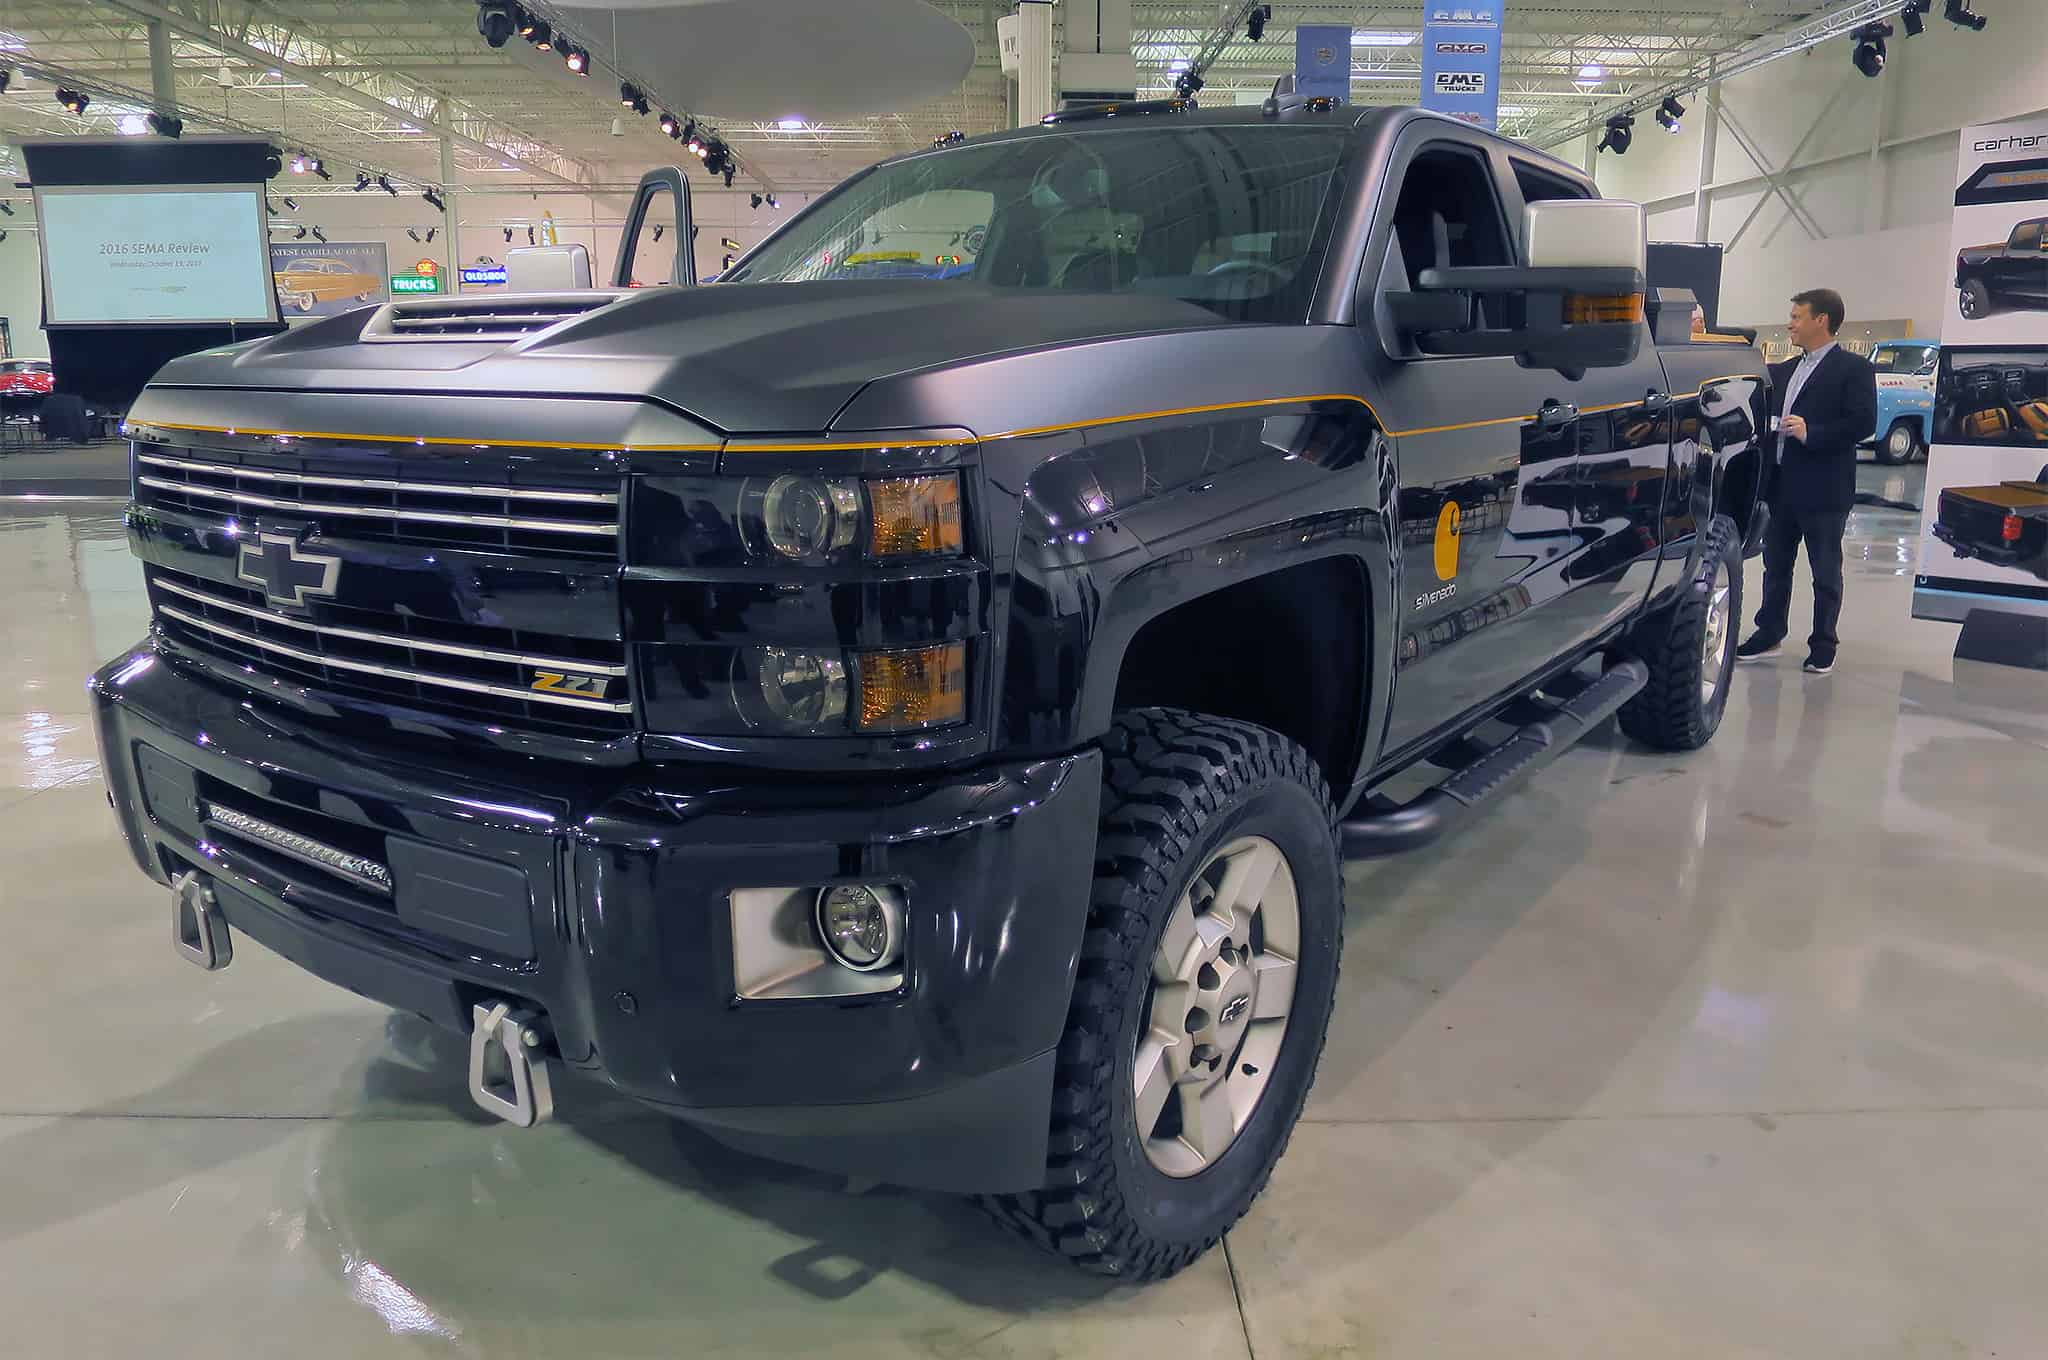 Custom Pickup Trucks & Concept Trucks - chevrolet-silverado-hd-carhartt-concept-front-three-quarter